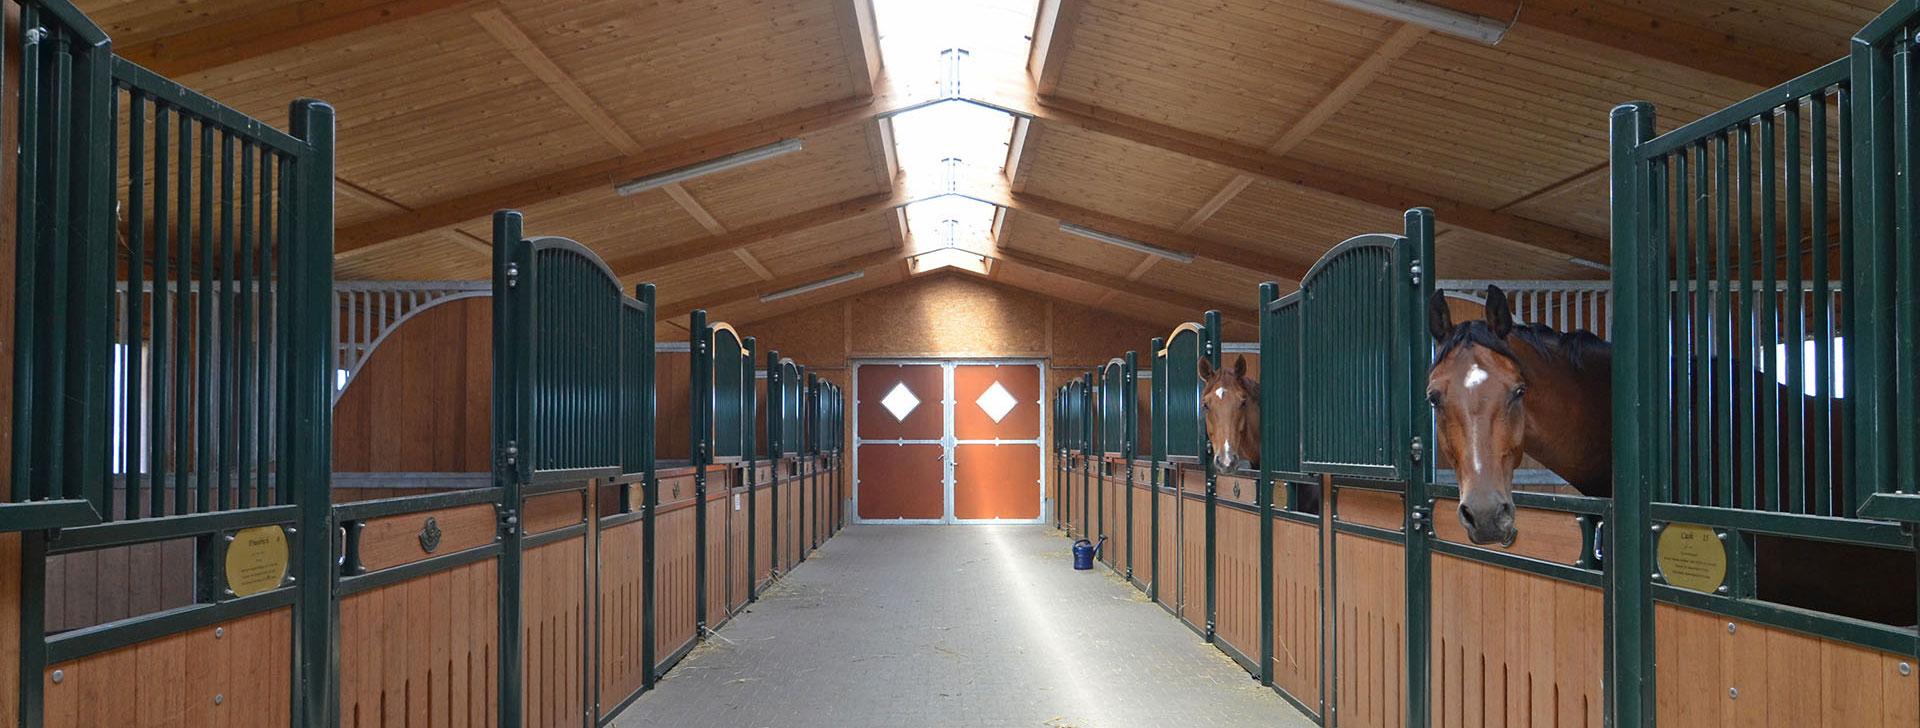 Pferdestall mit Rahmenkonstruktion